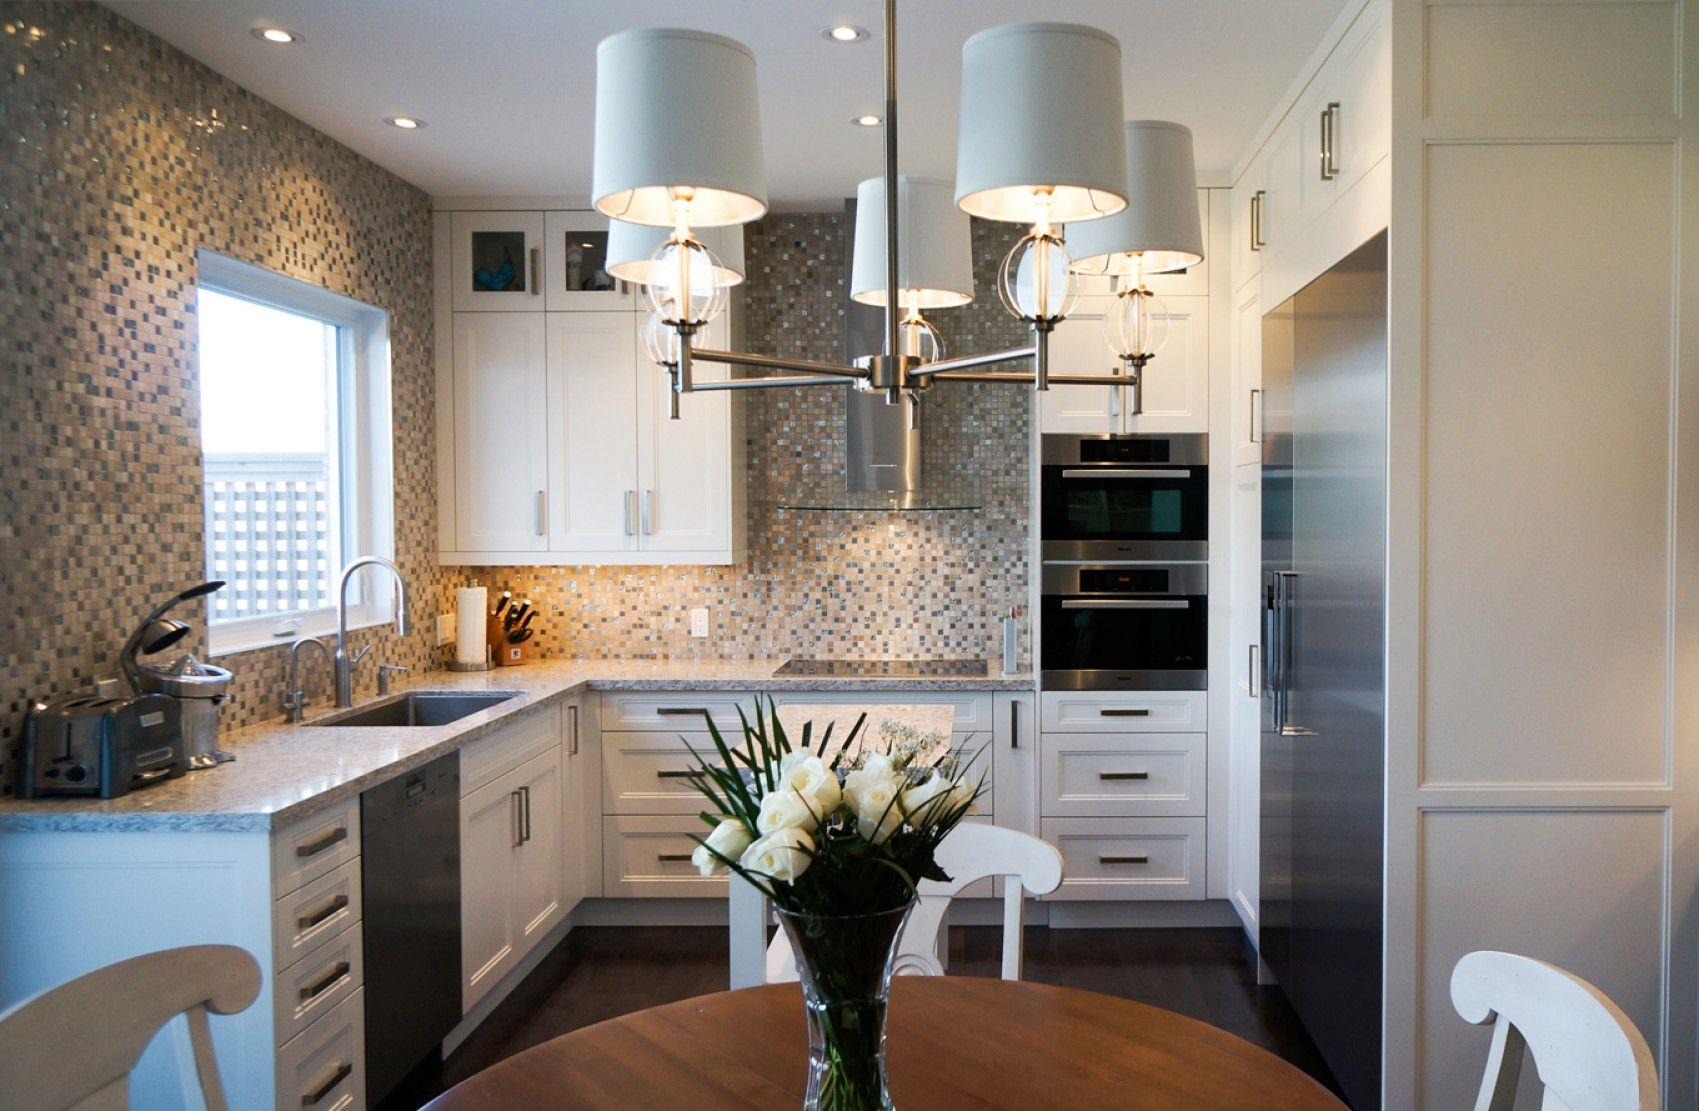 Oakville Kitchen & Bath Centre Kitchen and bath, Kitchen